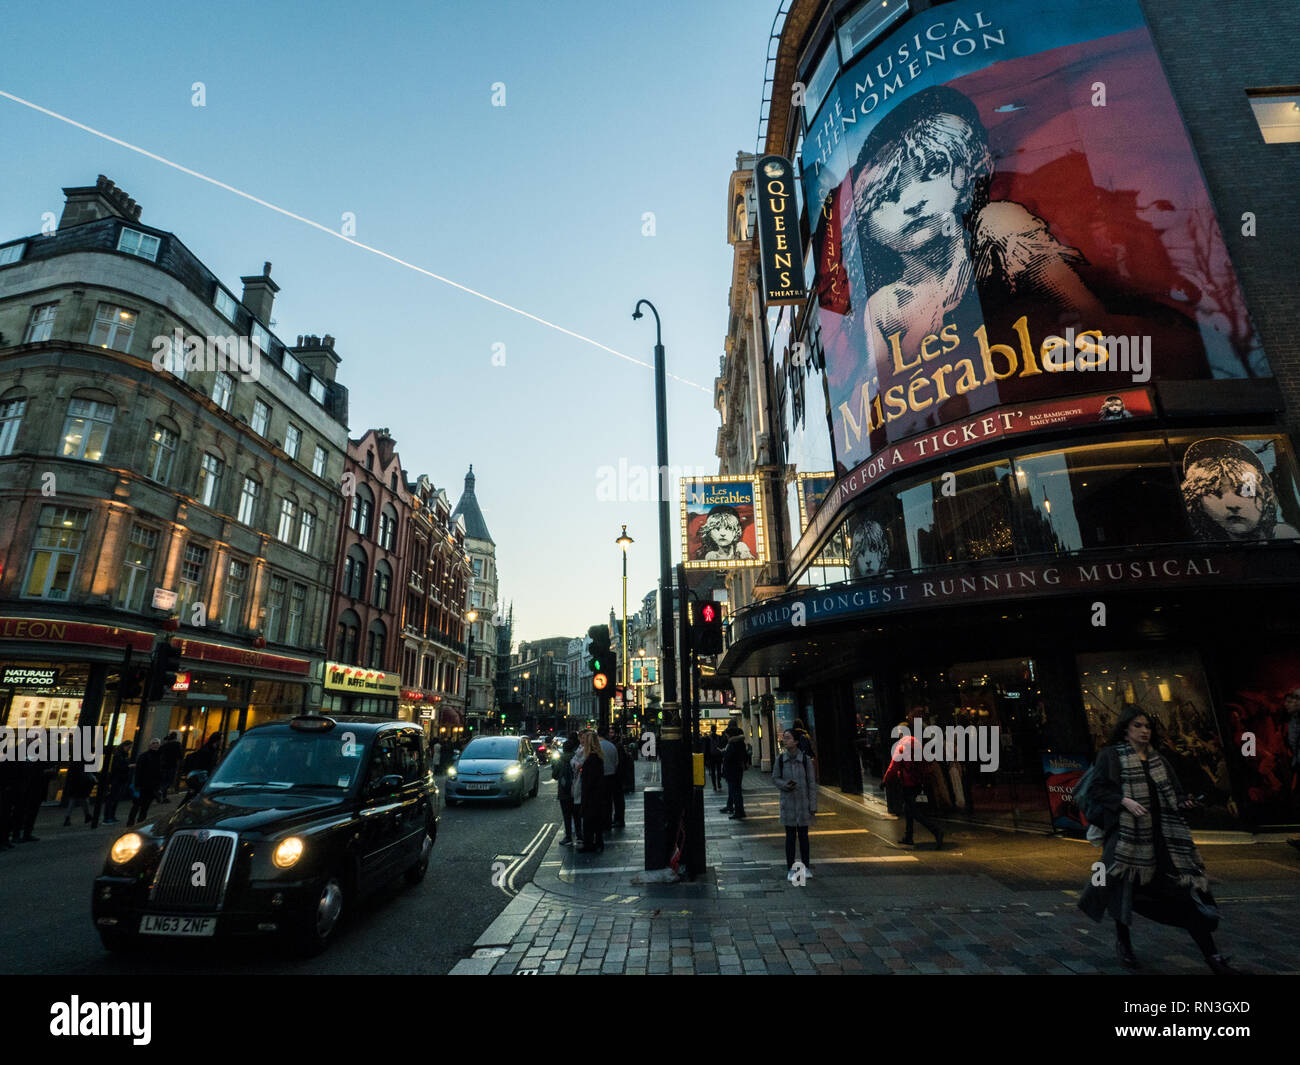 Les Miserables Zeichen am Queens Theatre in der Shaftesbury Avenue, London, England Stockfoto